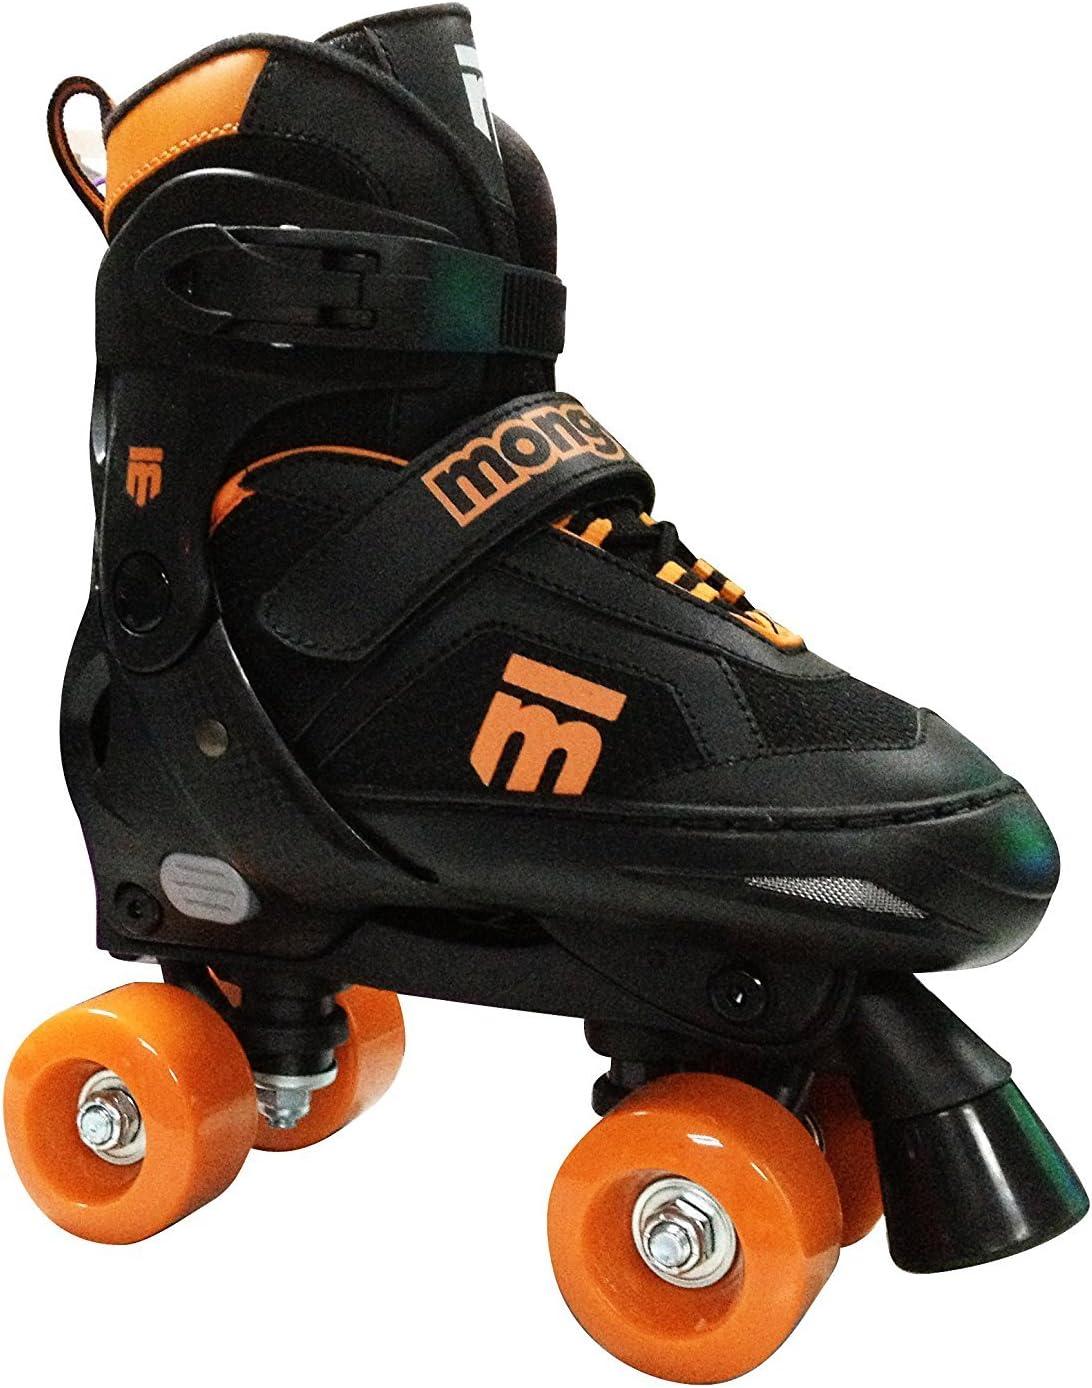 Mongoose Boy's Quad Roller Skates Small [並行輸入品]